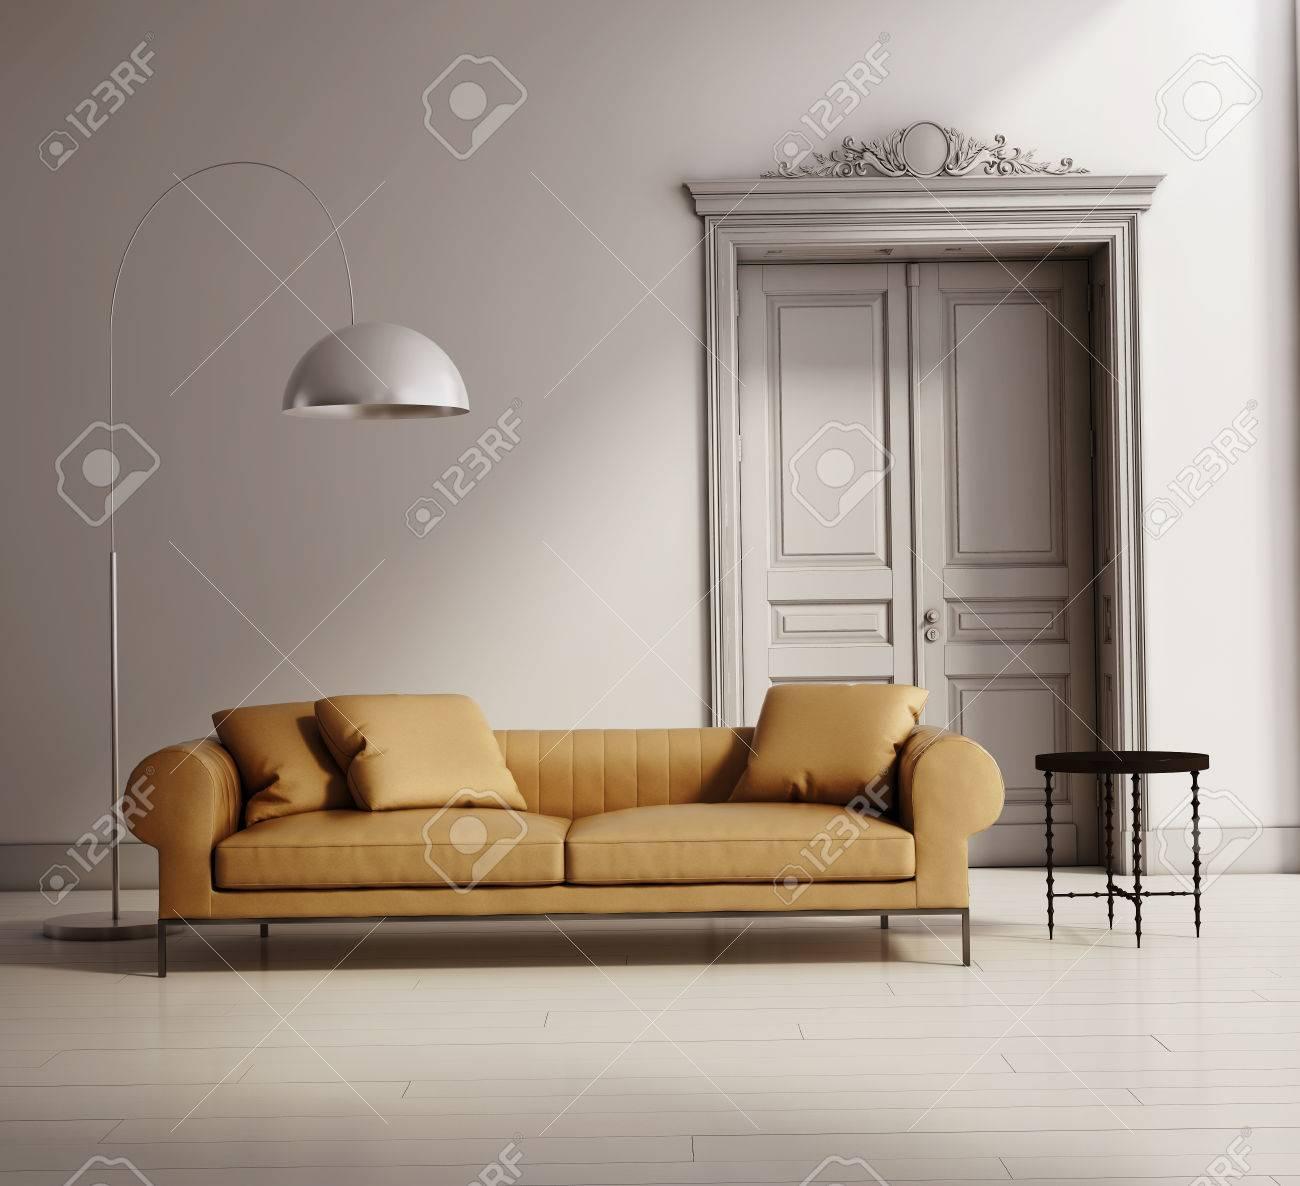 Contemporary Classic Living Room Beige Leather Sofa Wood Floor